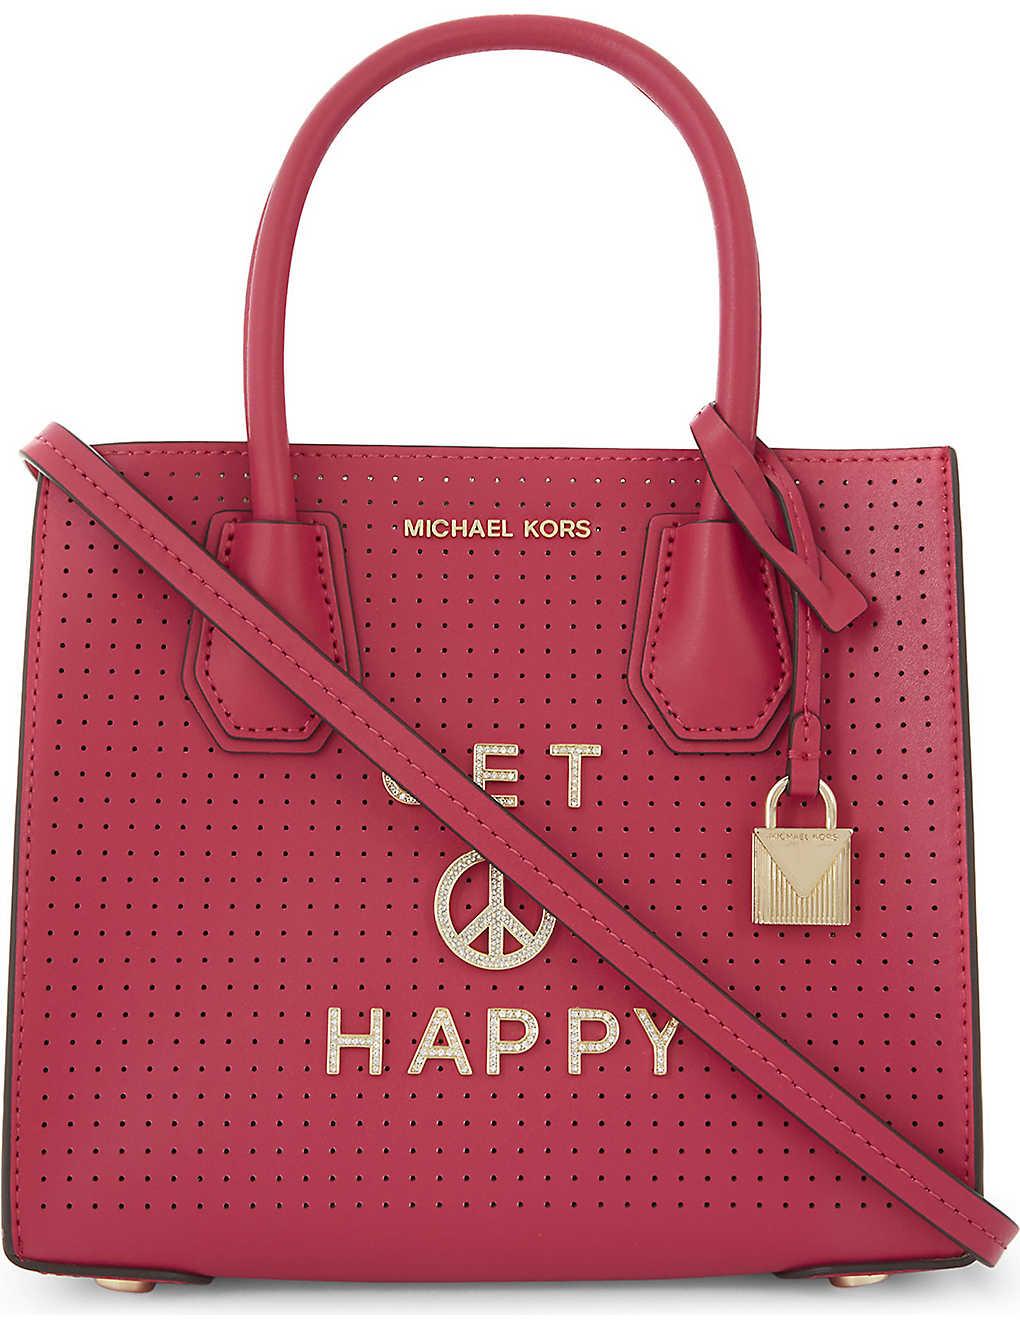 3c920b327aa4 MICHAEL MICHAEL KORS - Mercer perforated leather cross-body bag ...